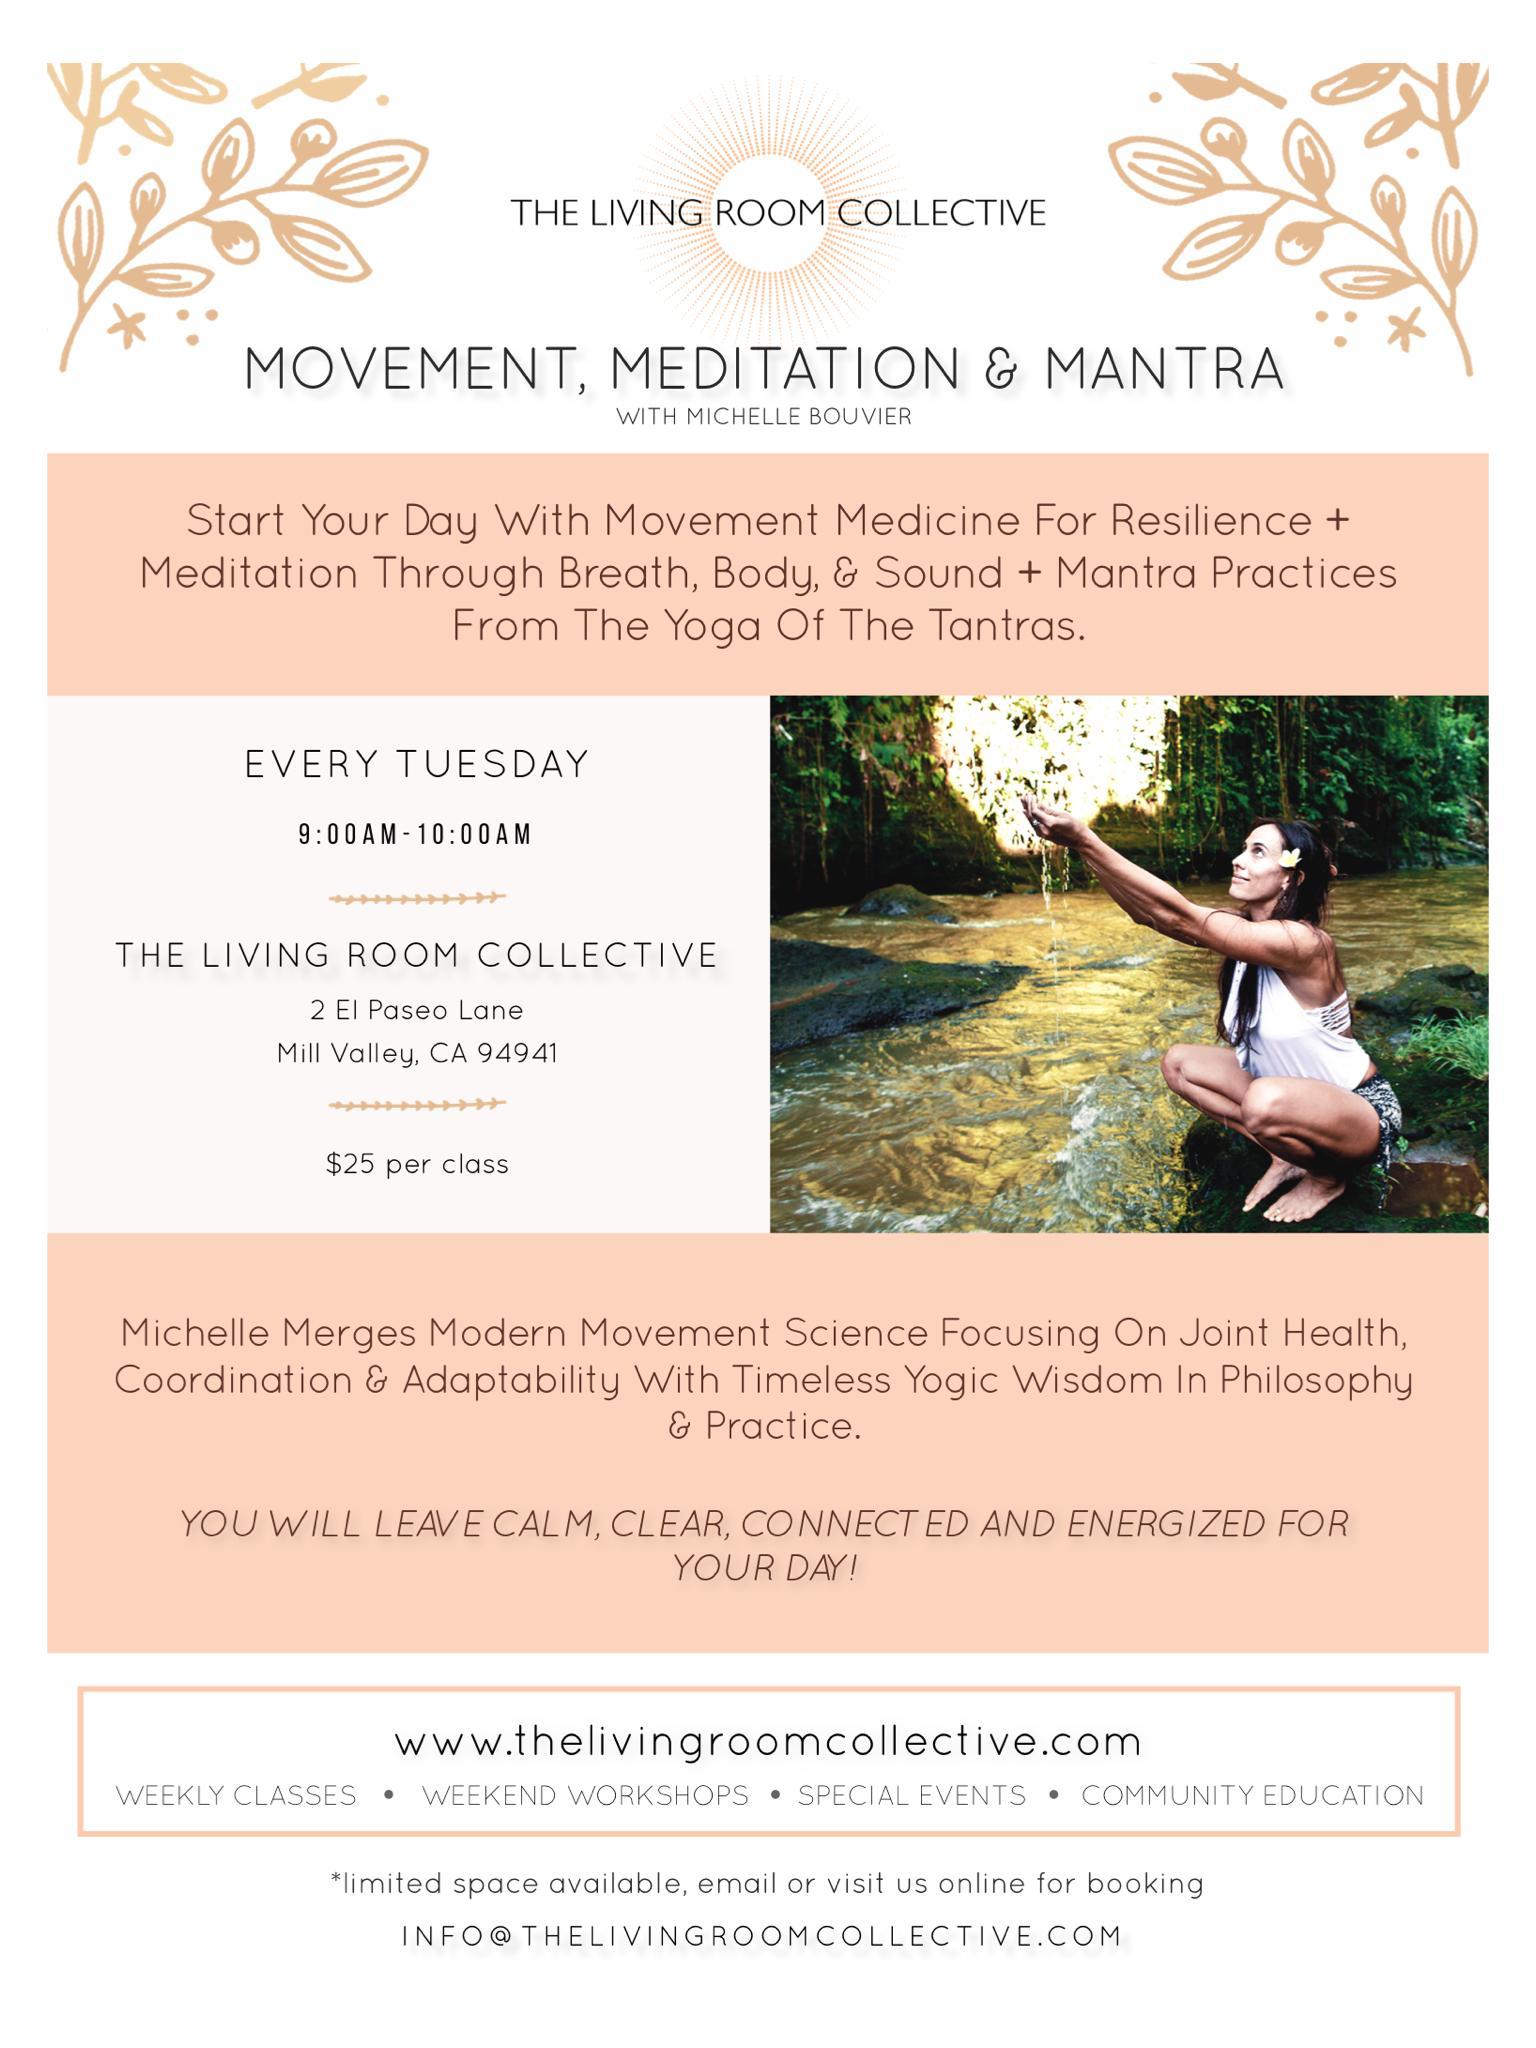 MMM ~ Movement Meditation & Mantra